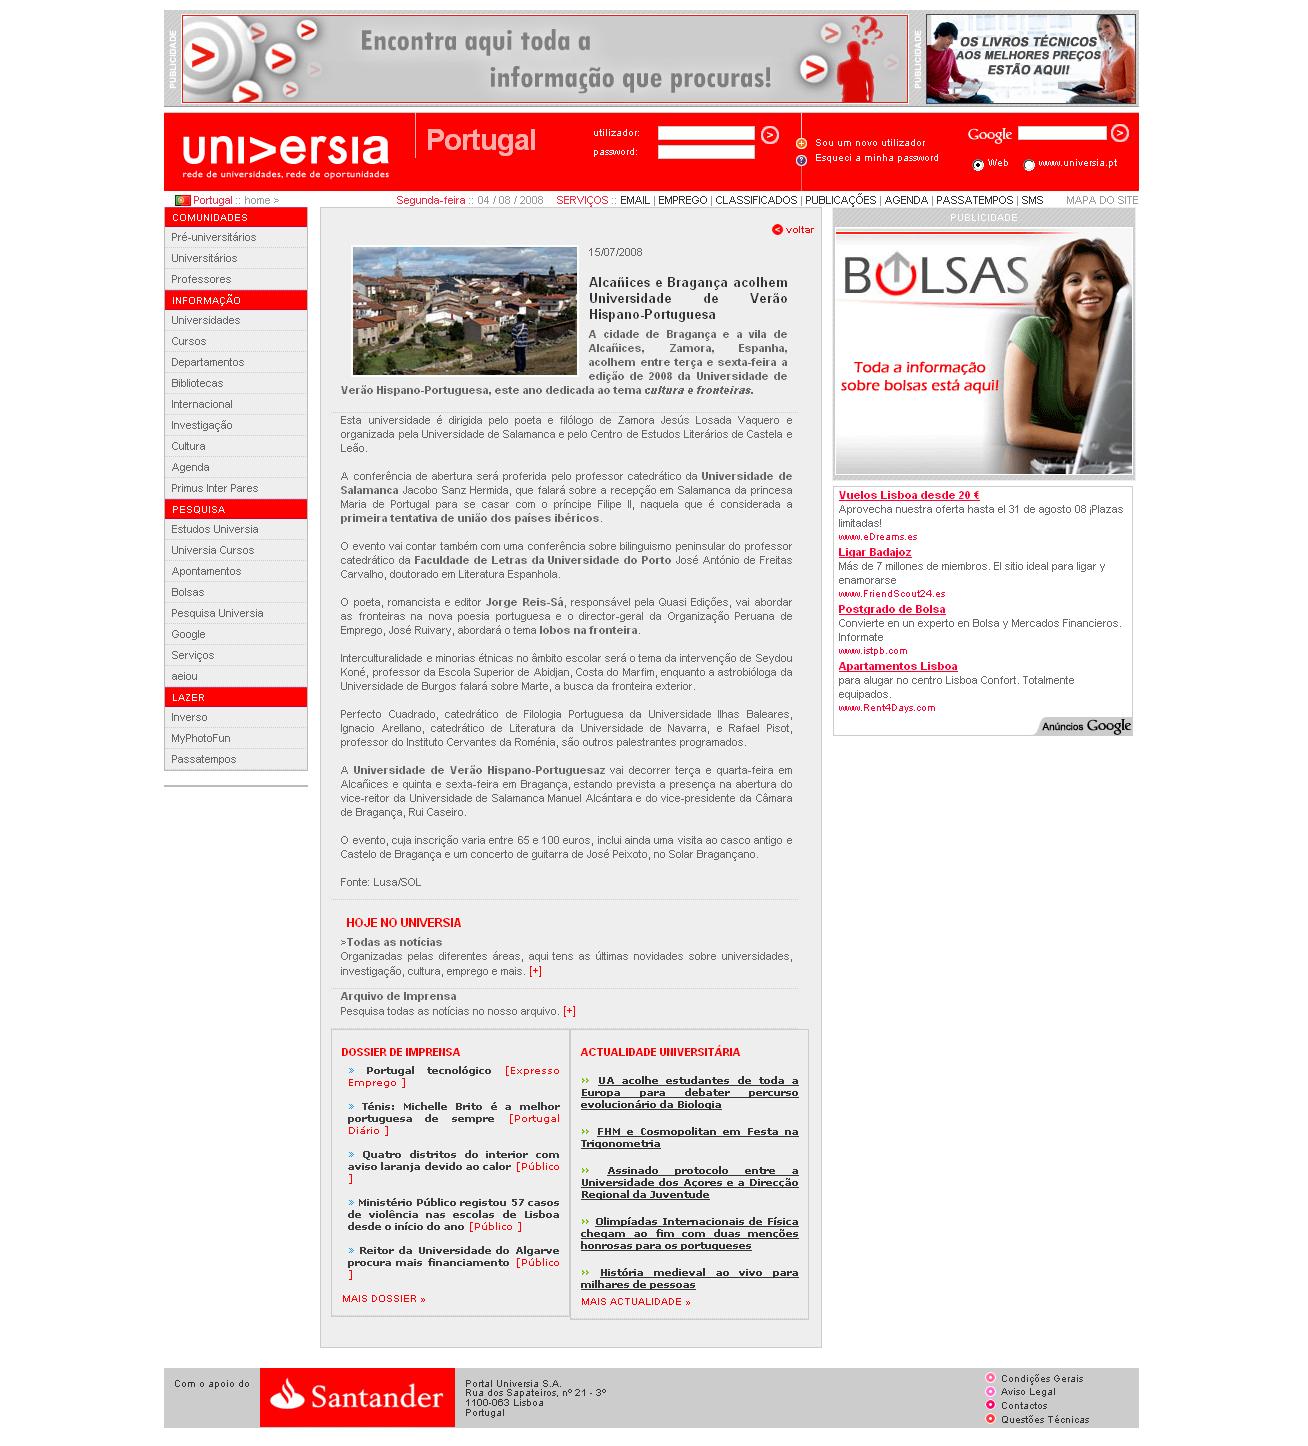 UNIVERSIA PORTUGAL: Universidad Hispano-Portuguesa 2008.